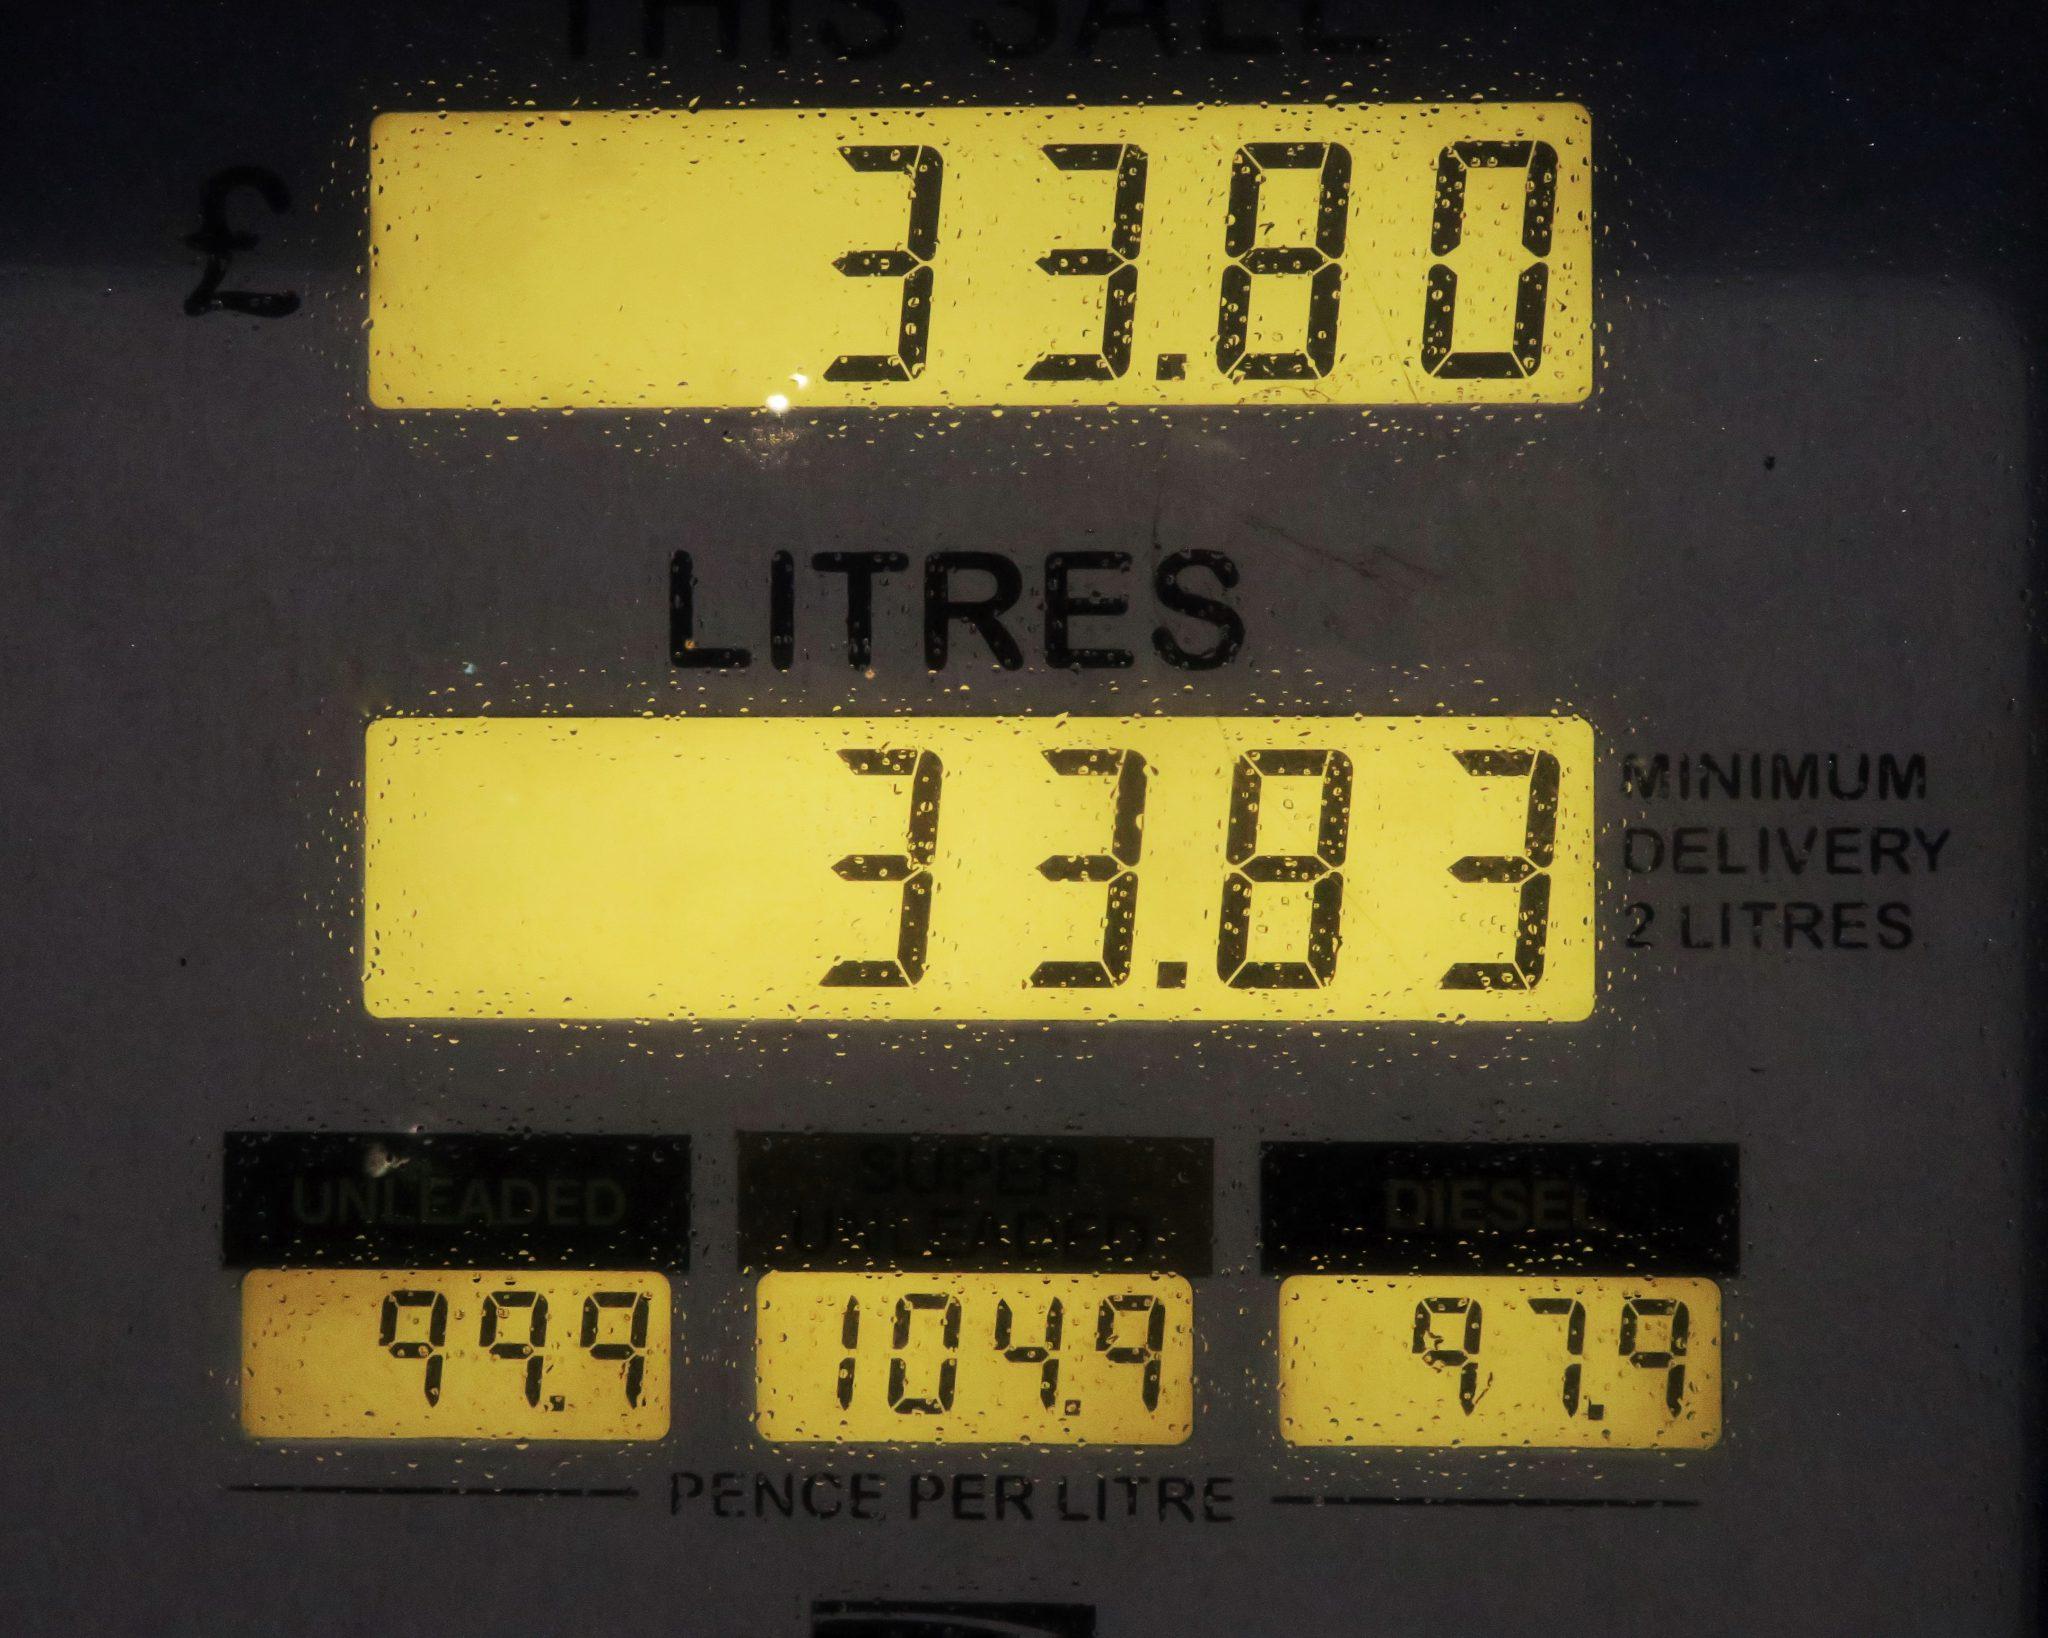 Petrol Cost Calculator